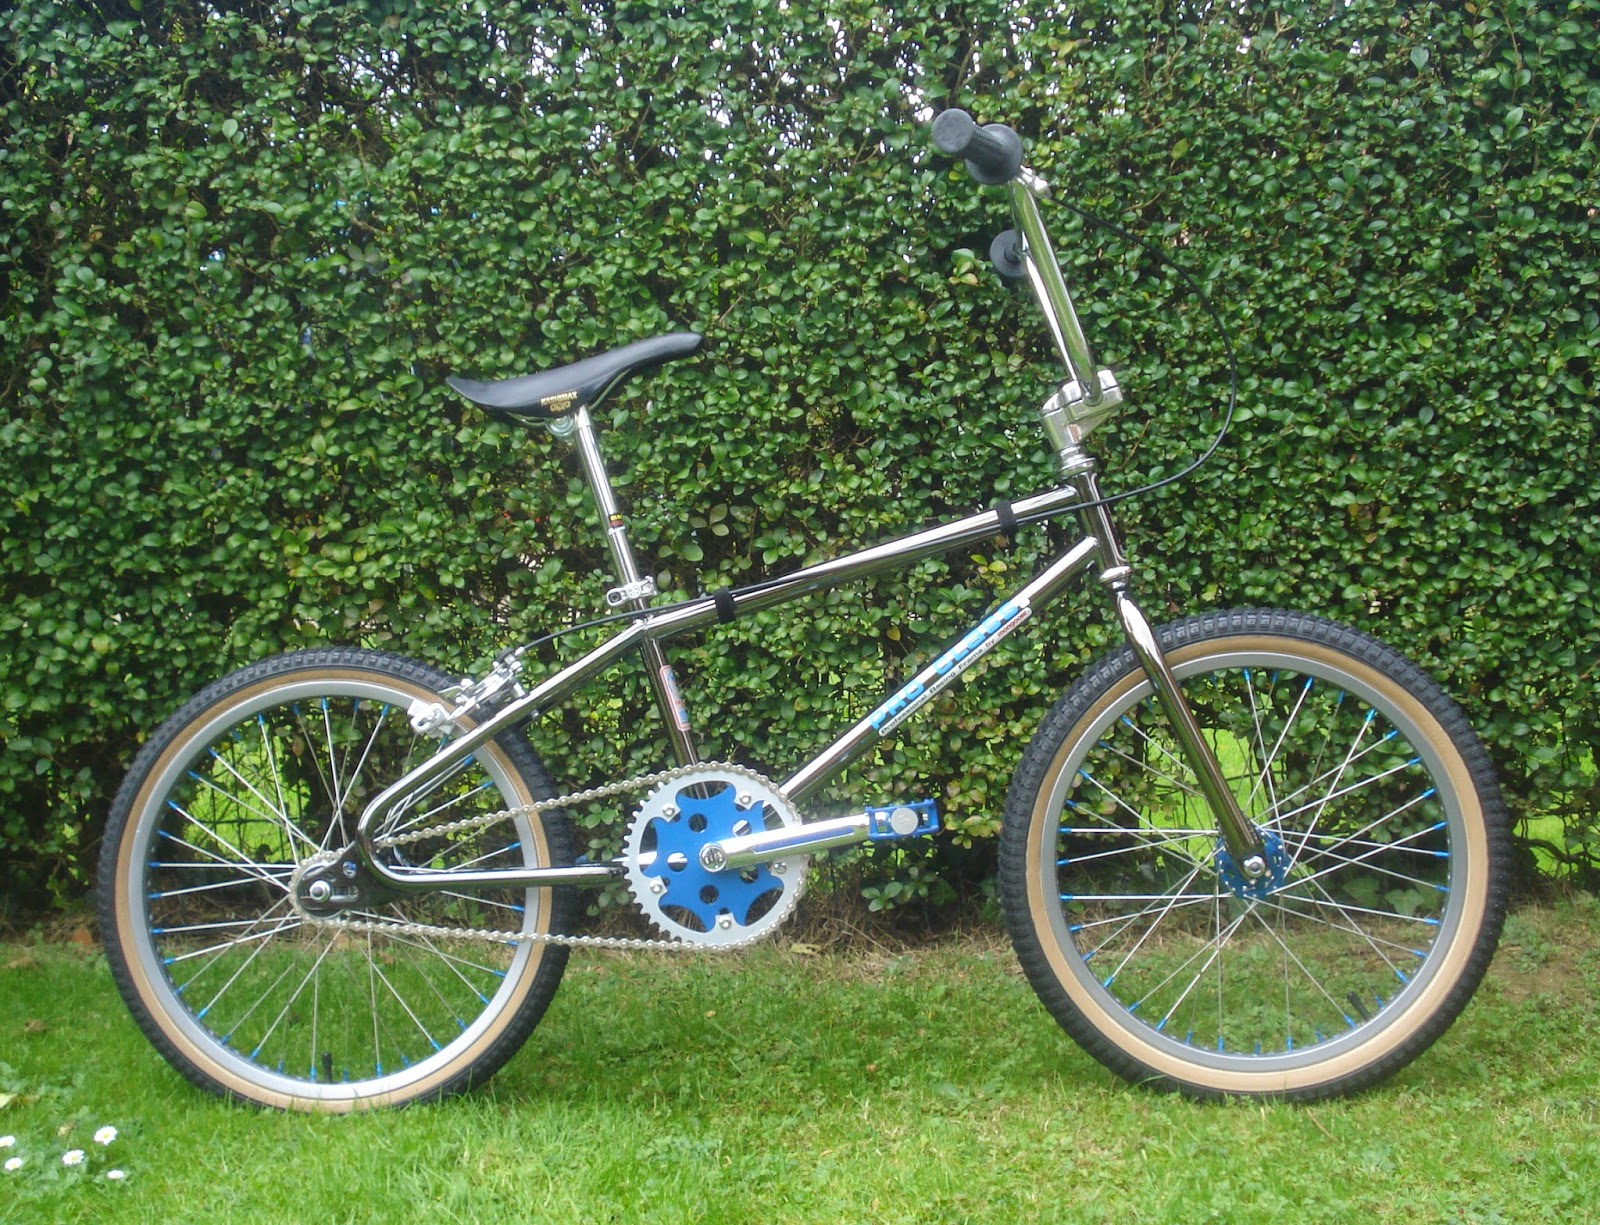 BMX BIKE OLD SCHOOL VINTAGE HANDLEBAR BAR CHROME